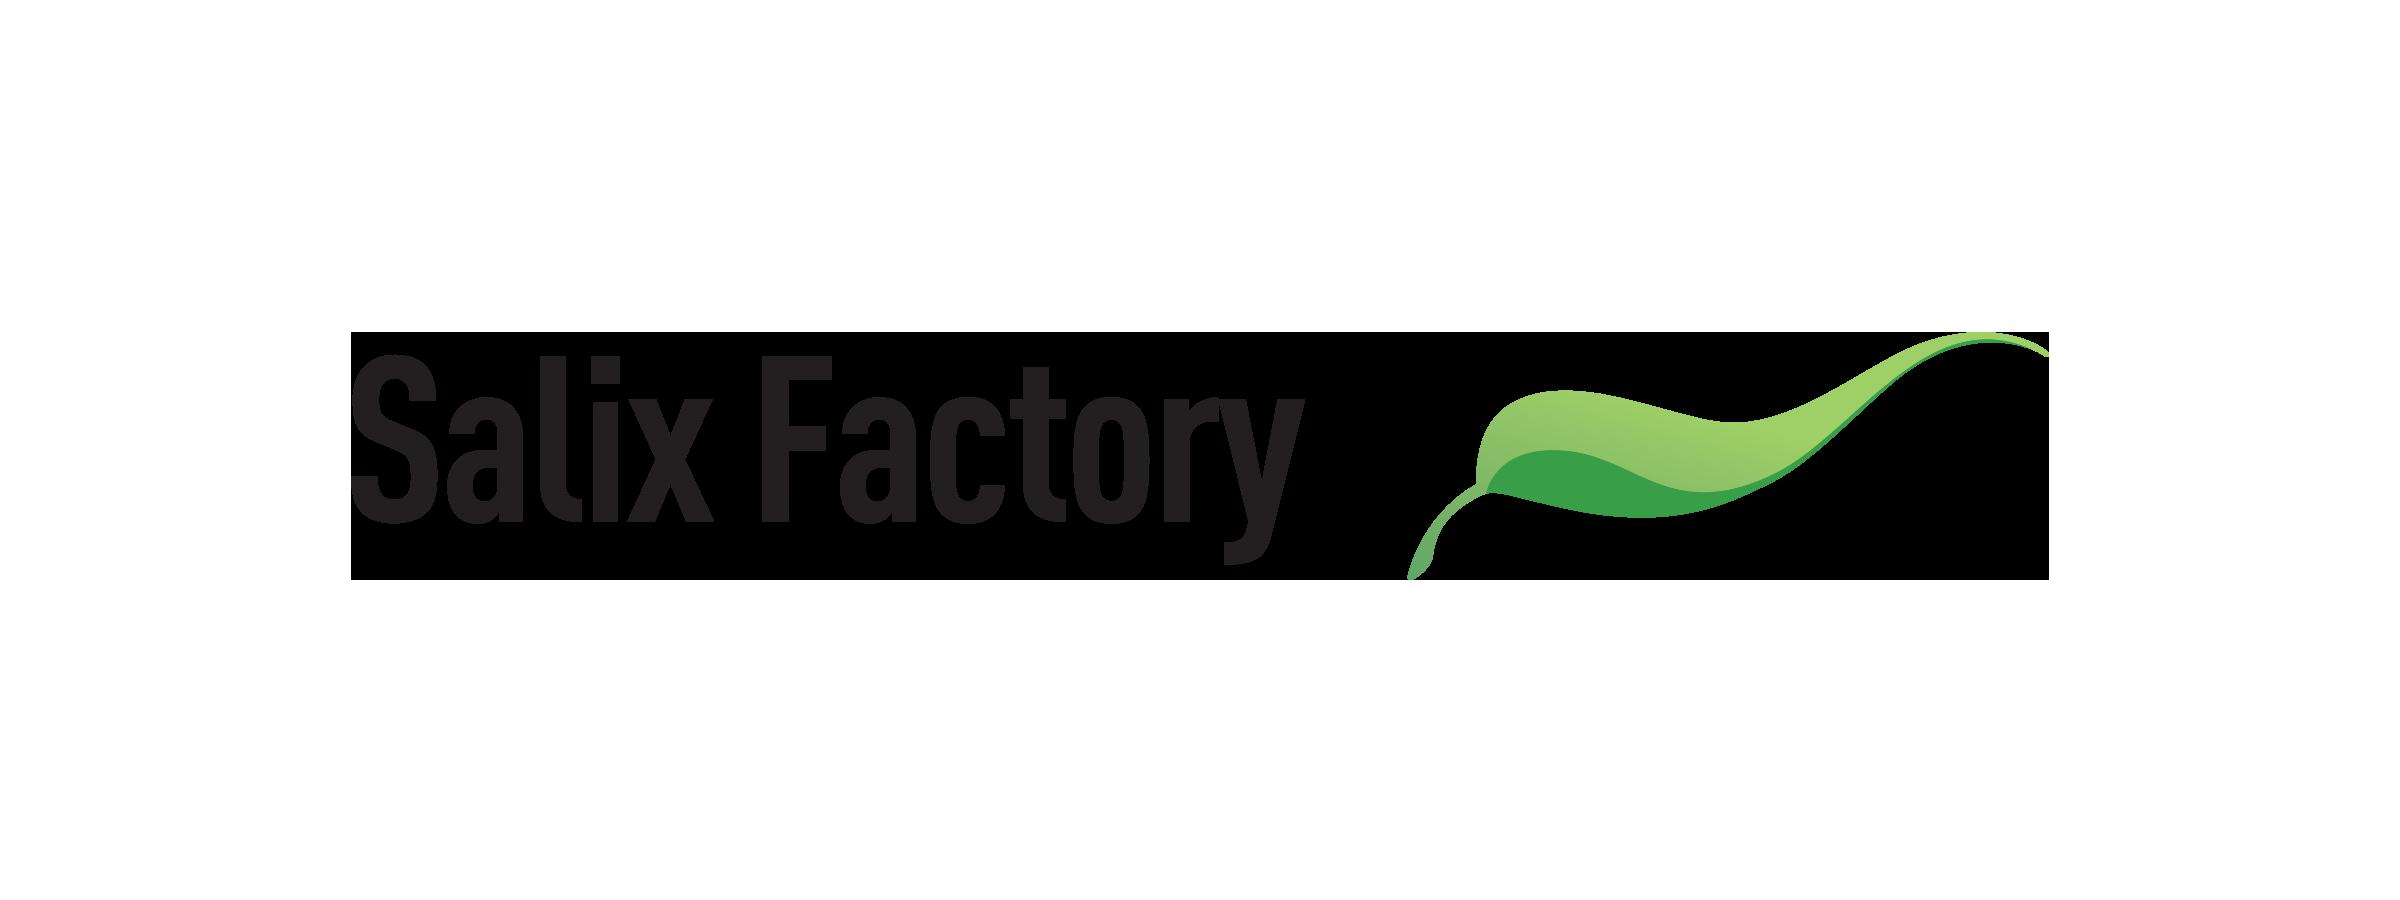 Salix Factory